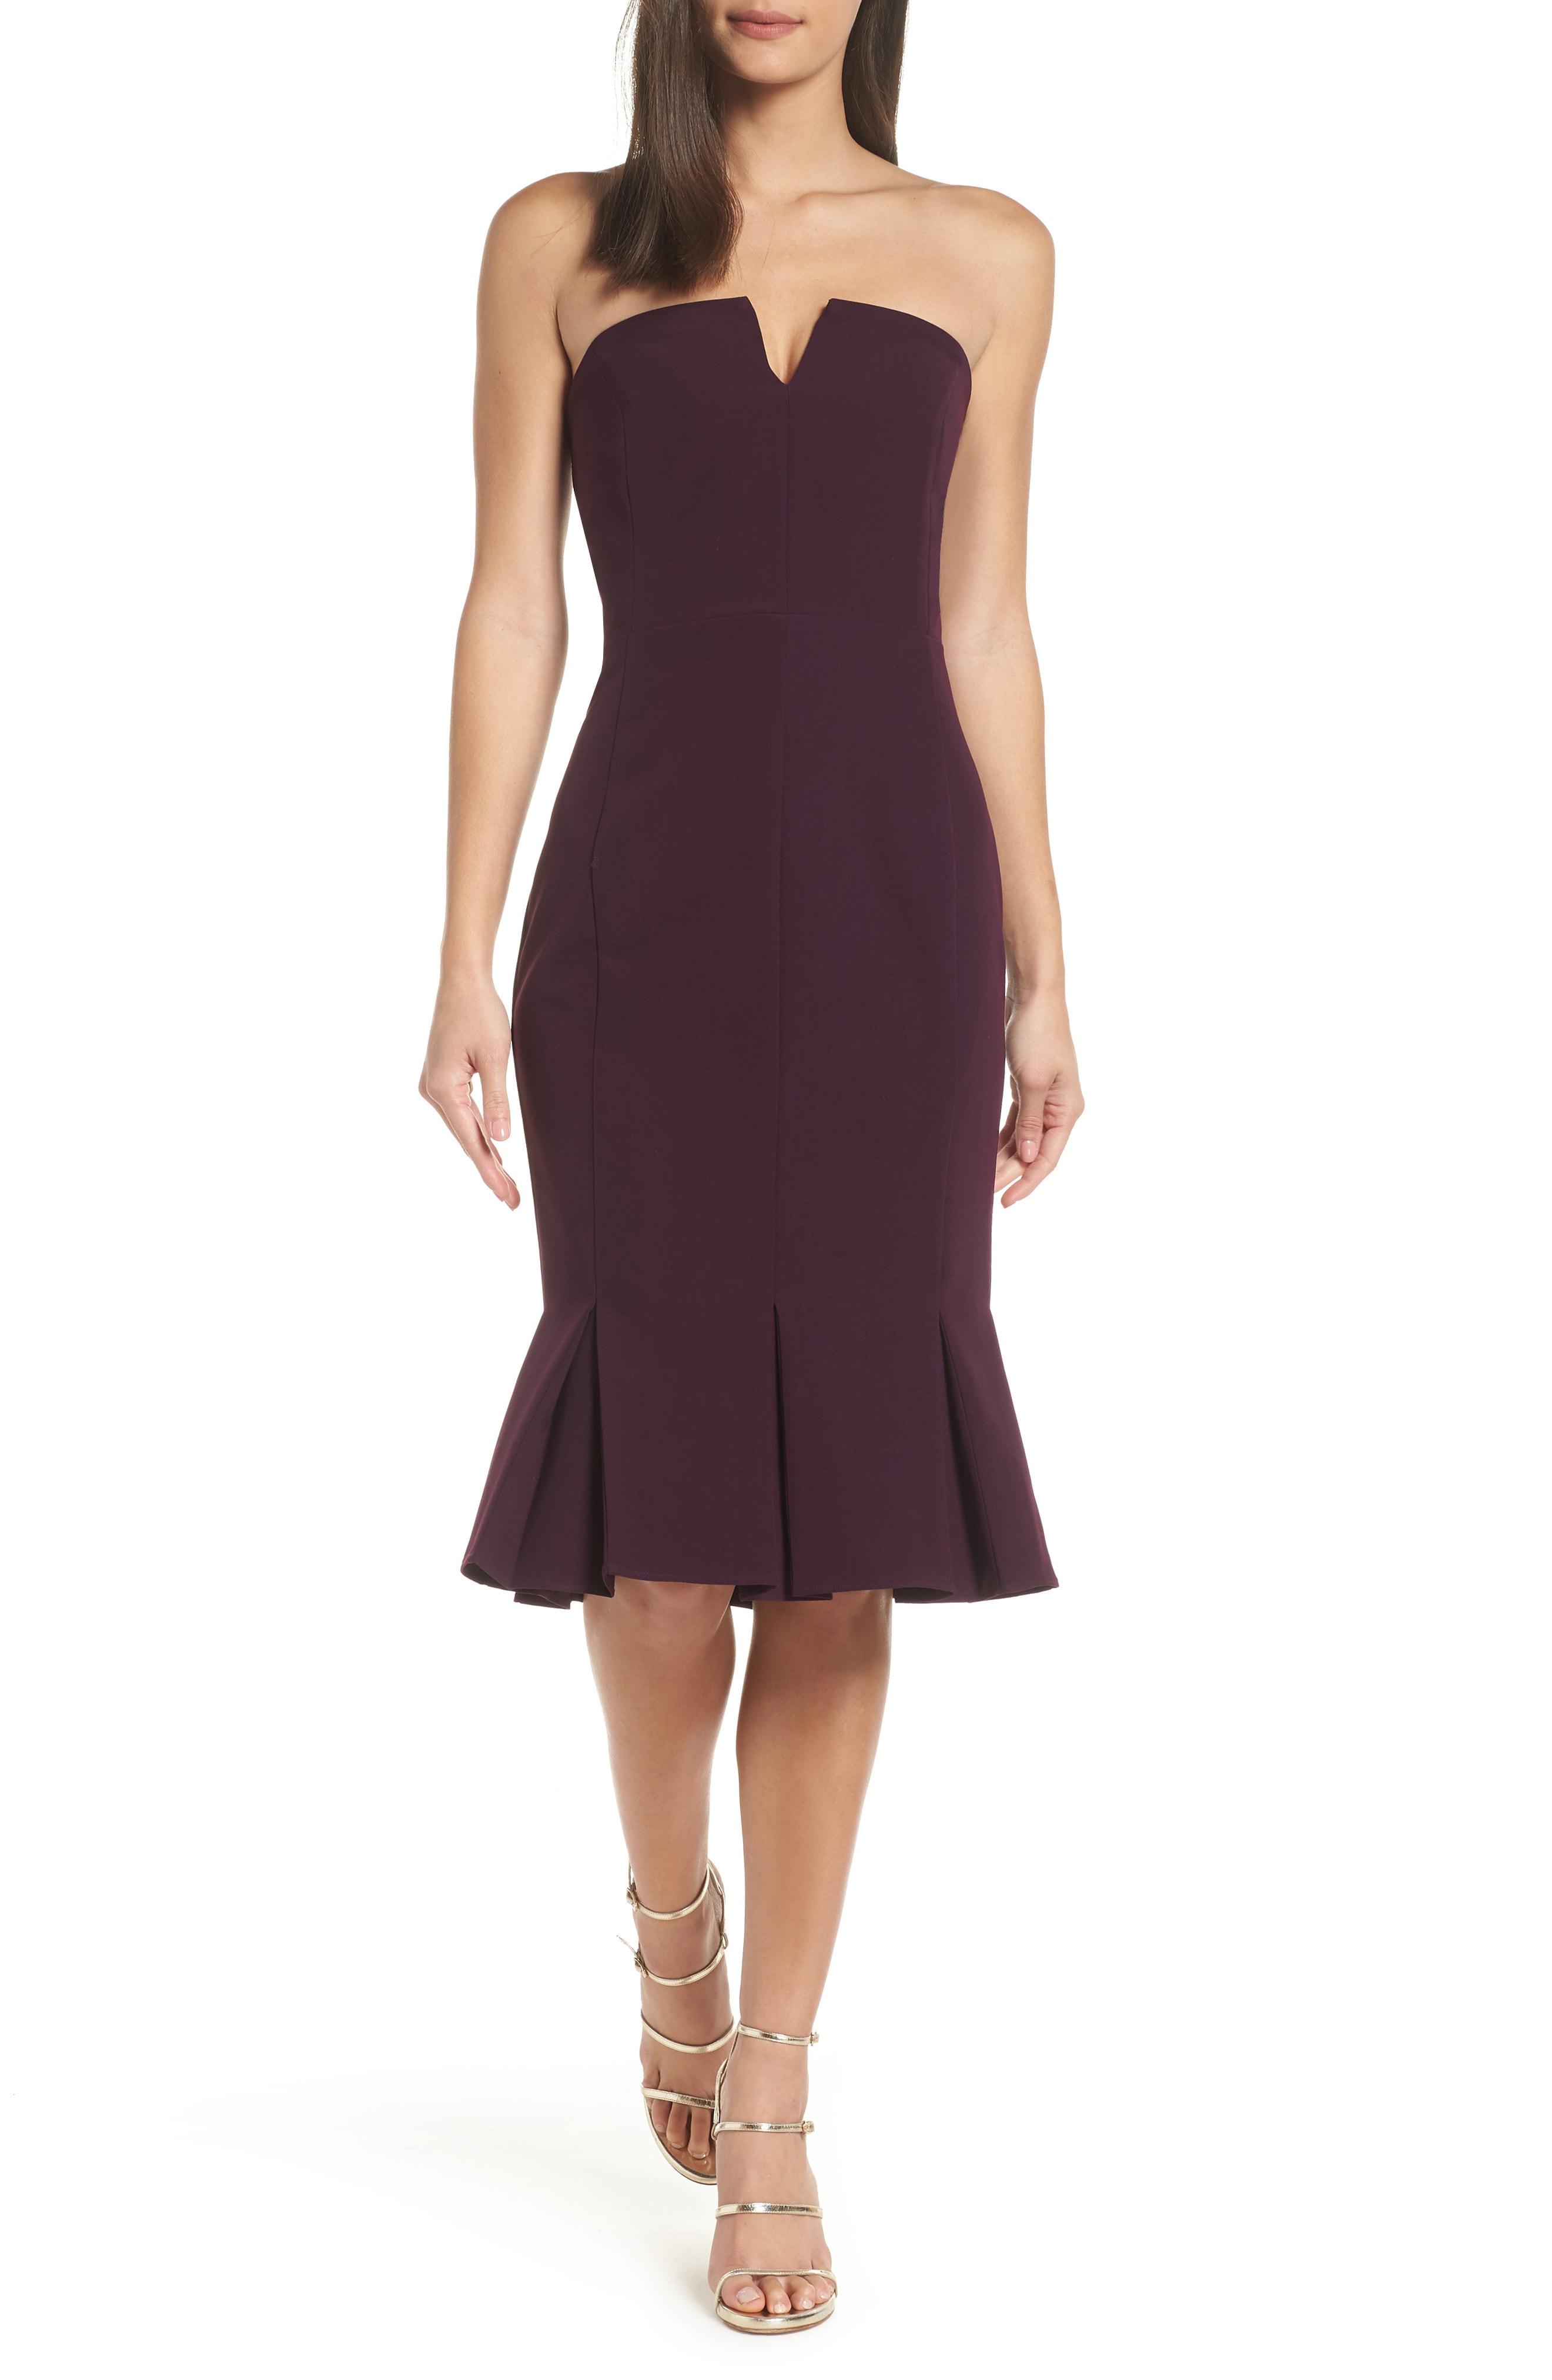 Adelyn Rae Alexis Strapless Dress